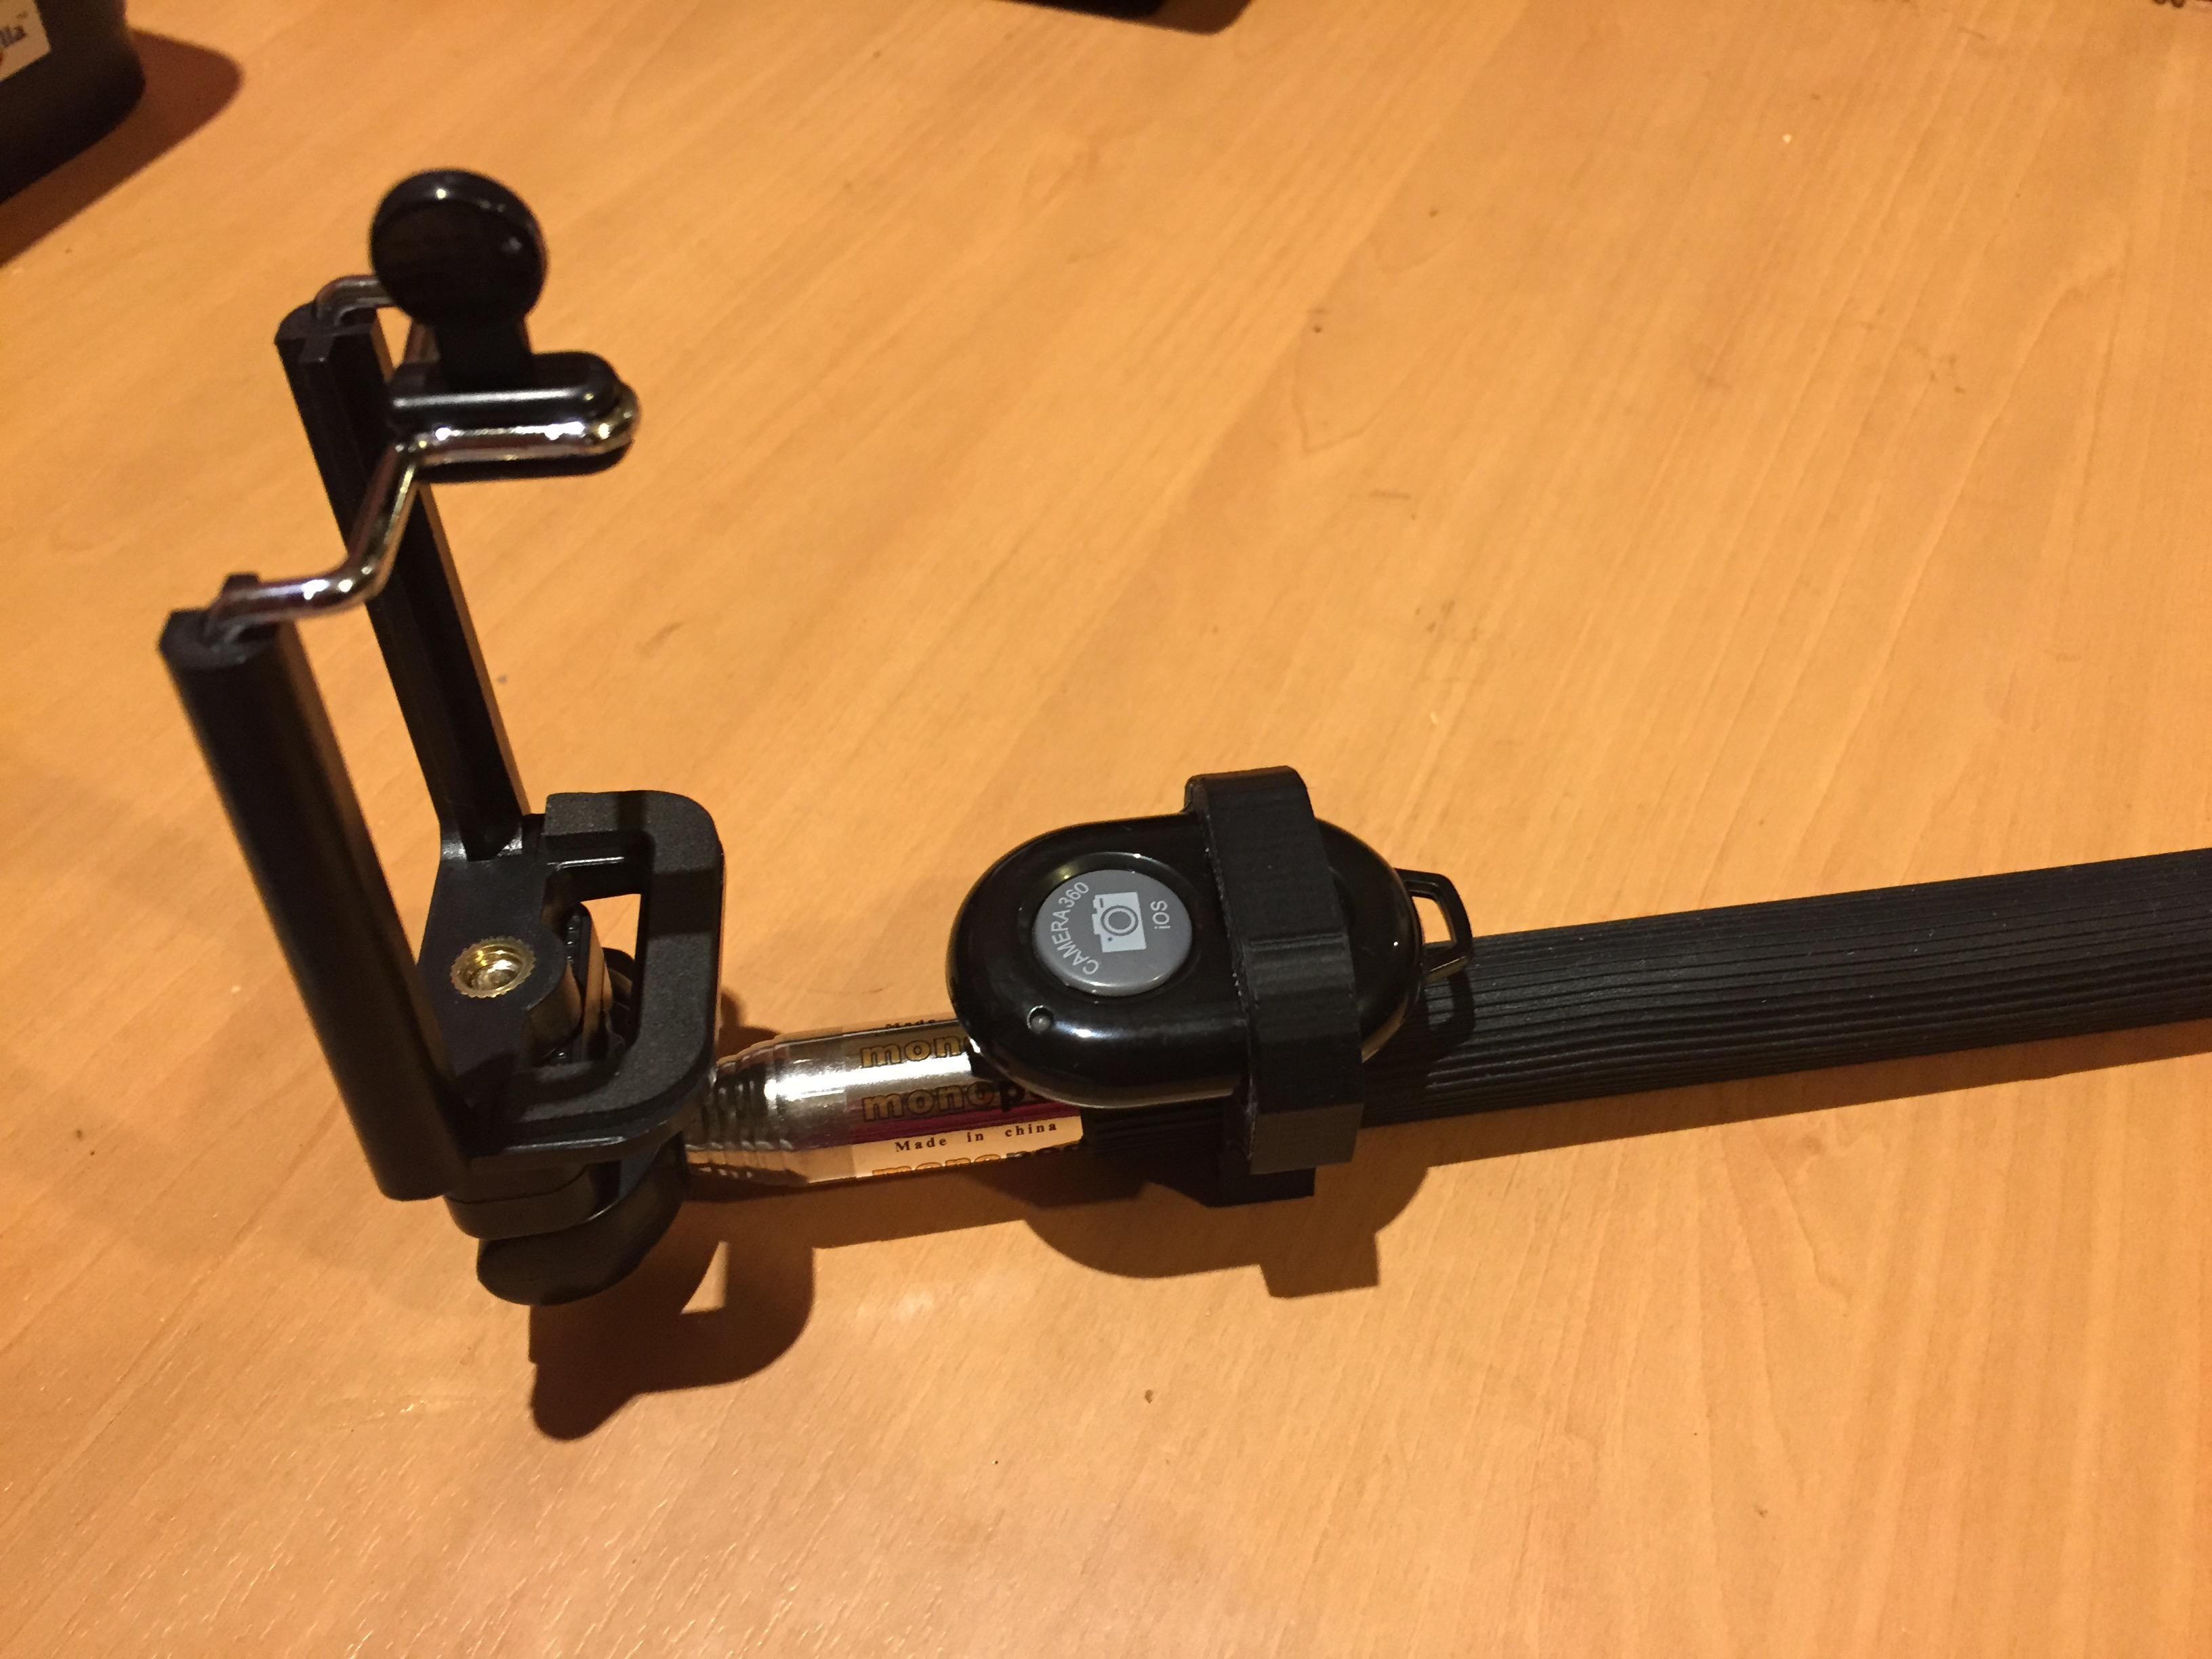 Selfie Stick And Bluetooth Shutter Remote Holder By Tooraj